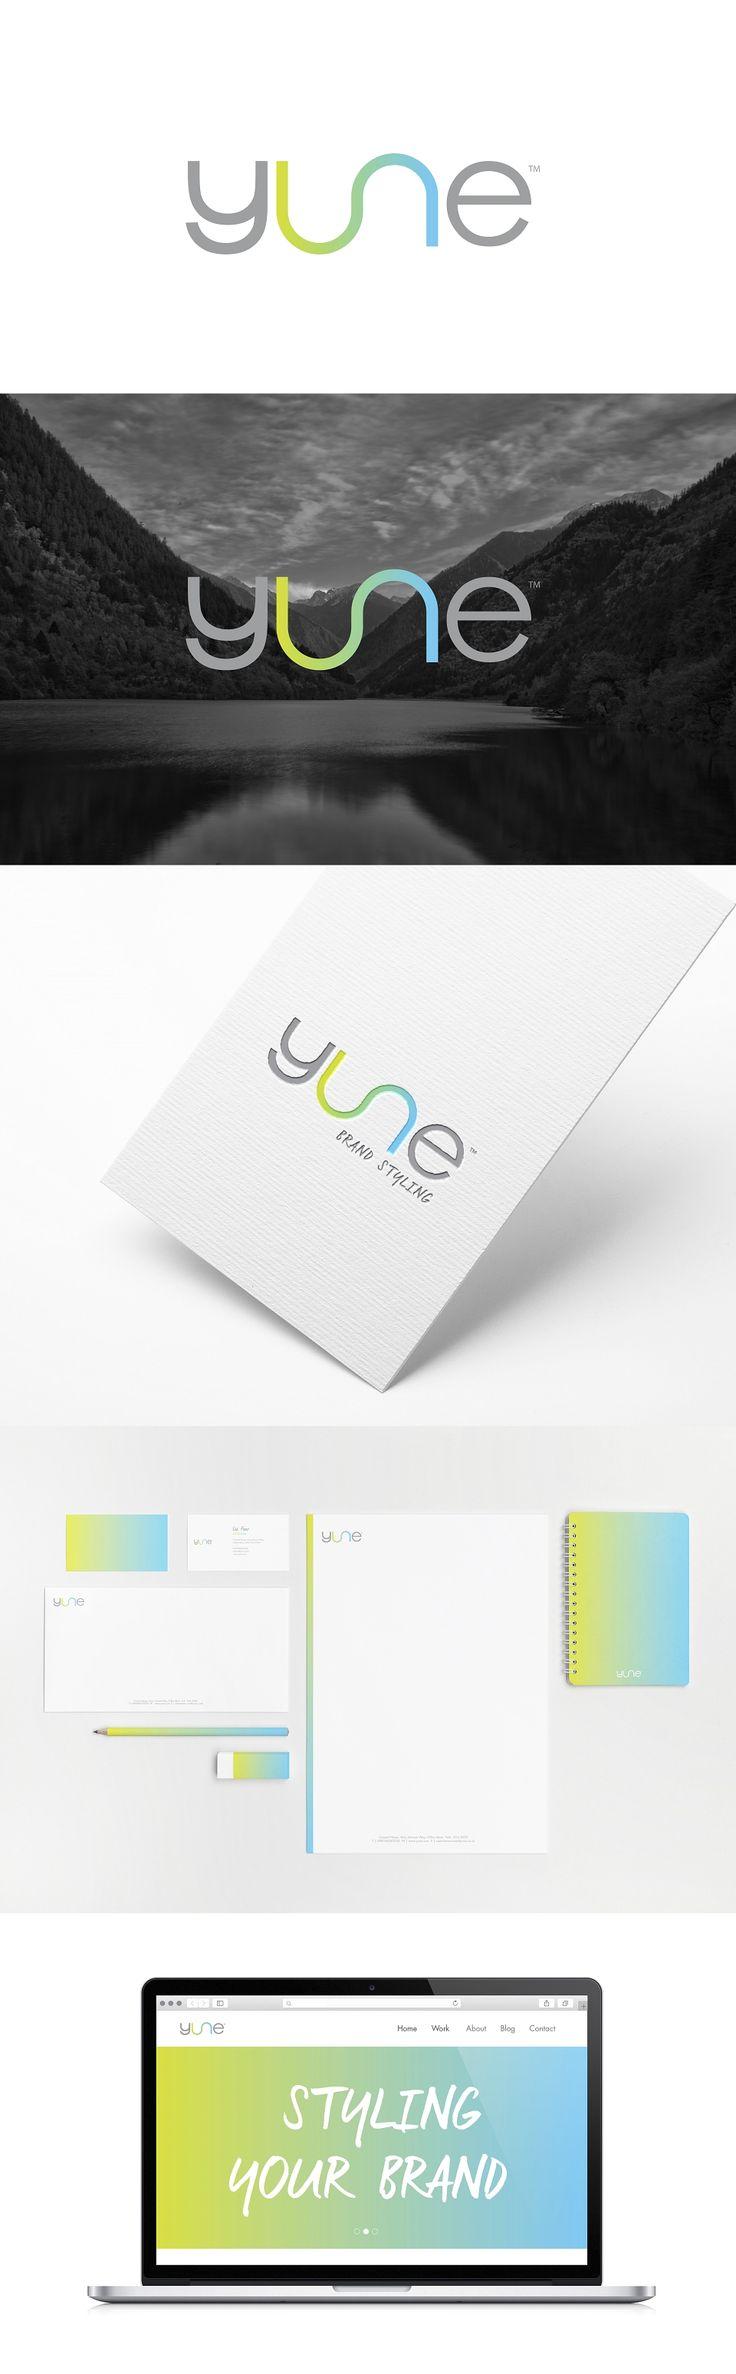 Yune brand identity.